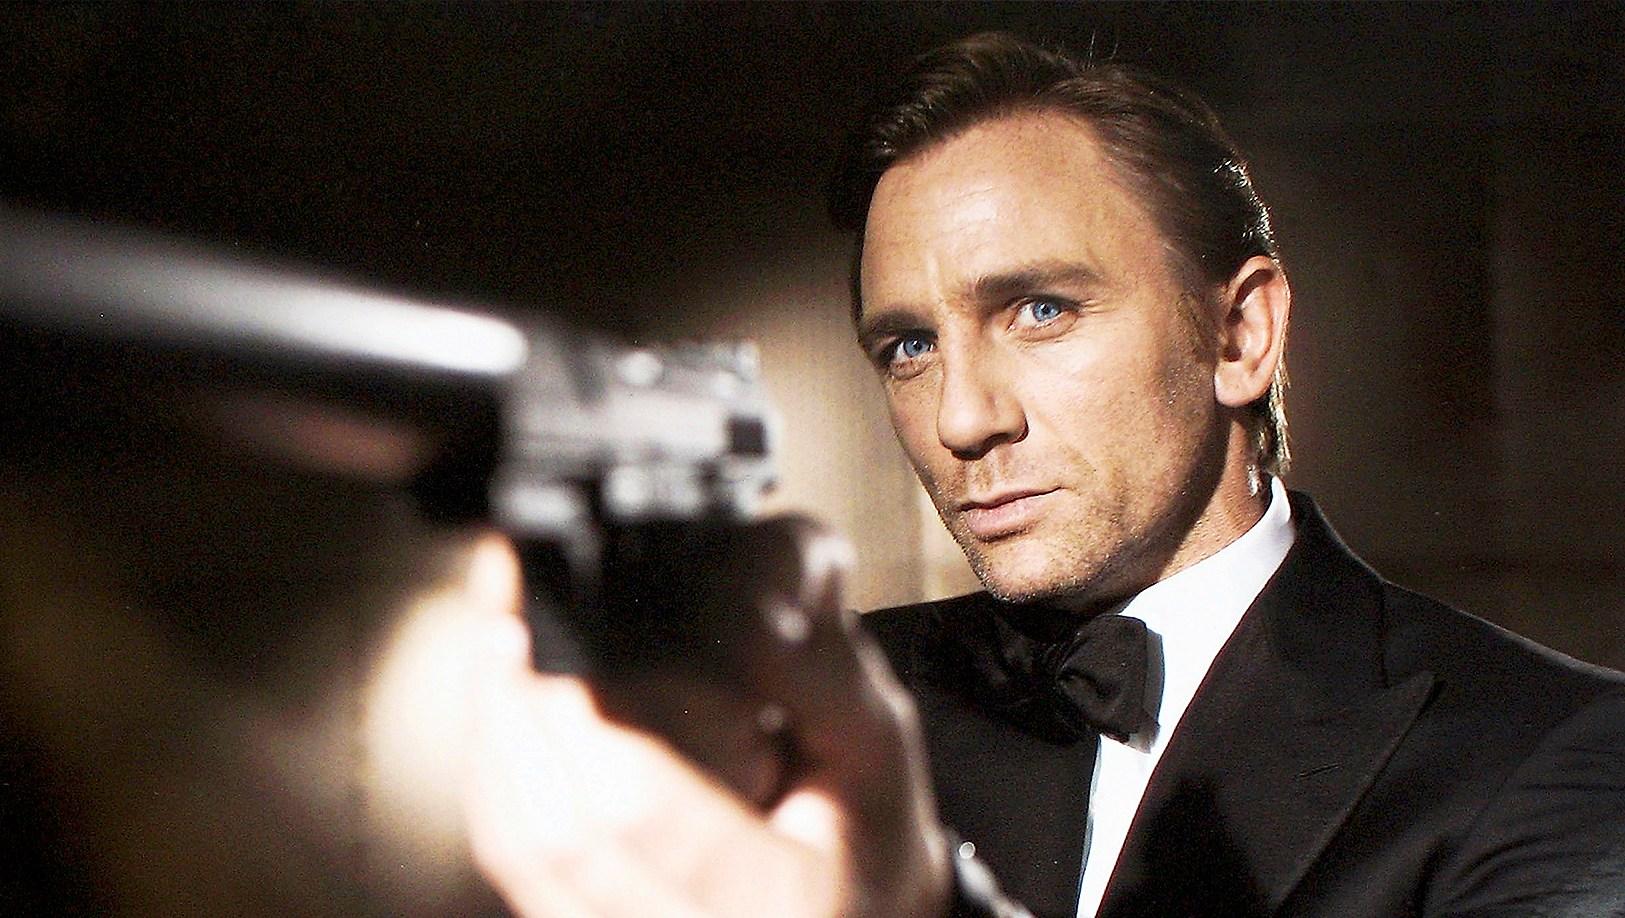 Daniel Craig poses as legendary British secret agent James Bond 007 in 'Casino Royale'